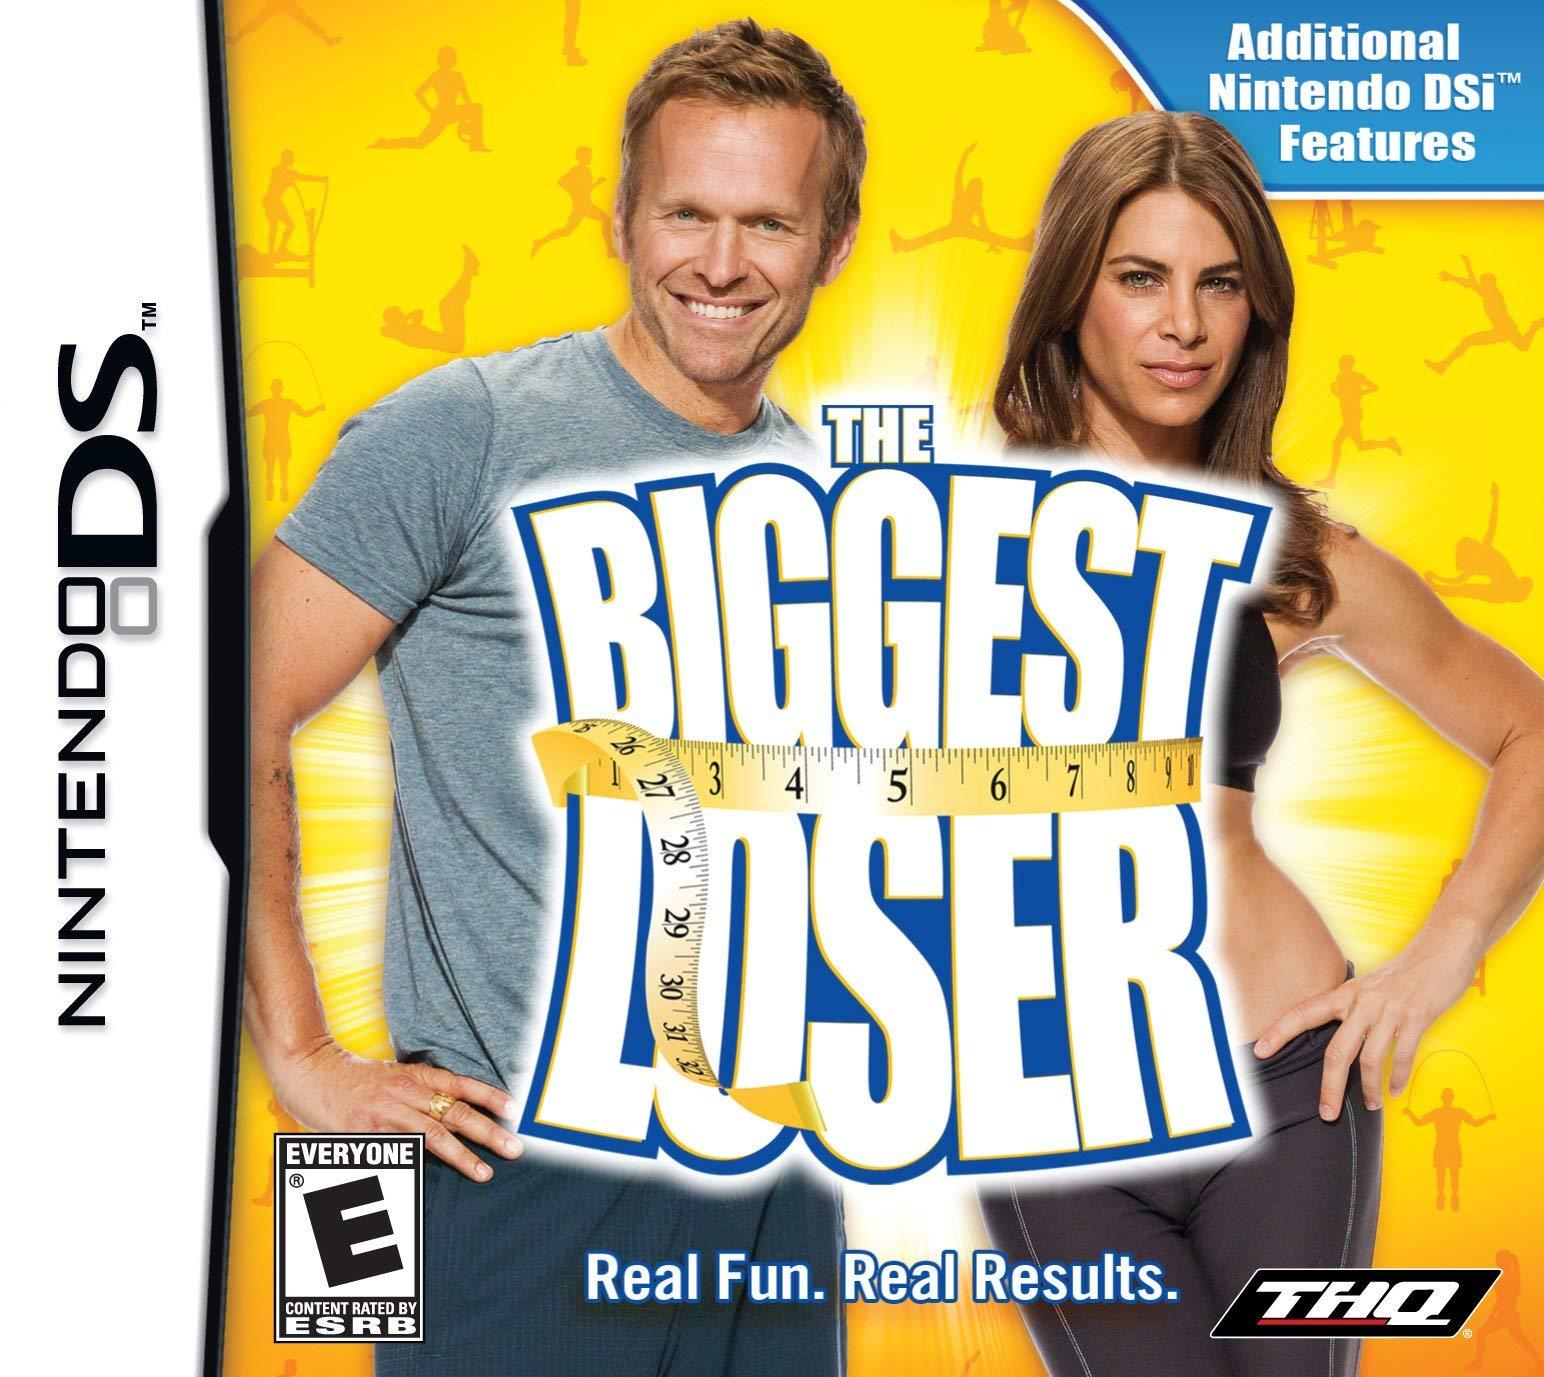 Biggest Loser - Nintendo DS (Certified Refurbished)